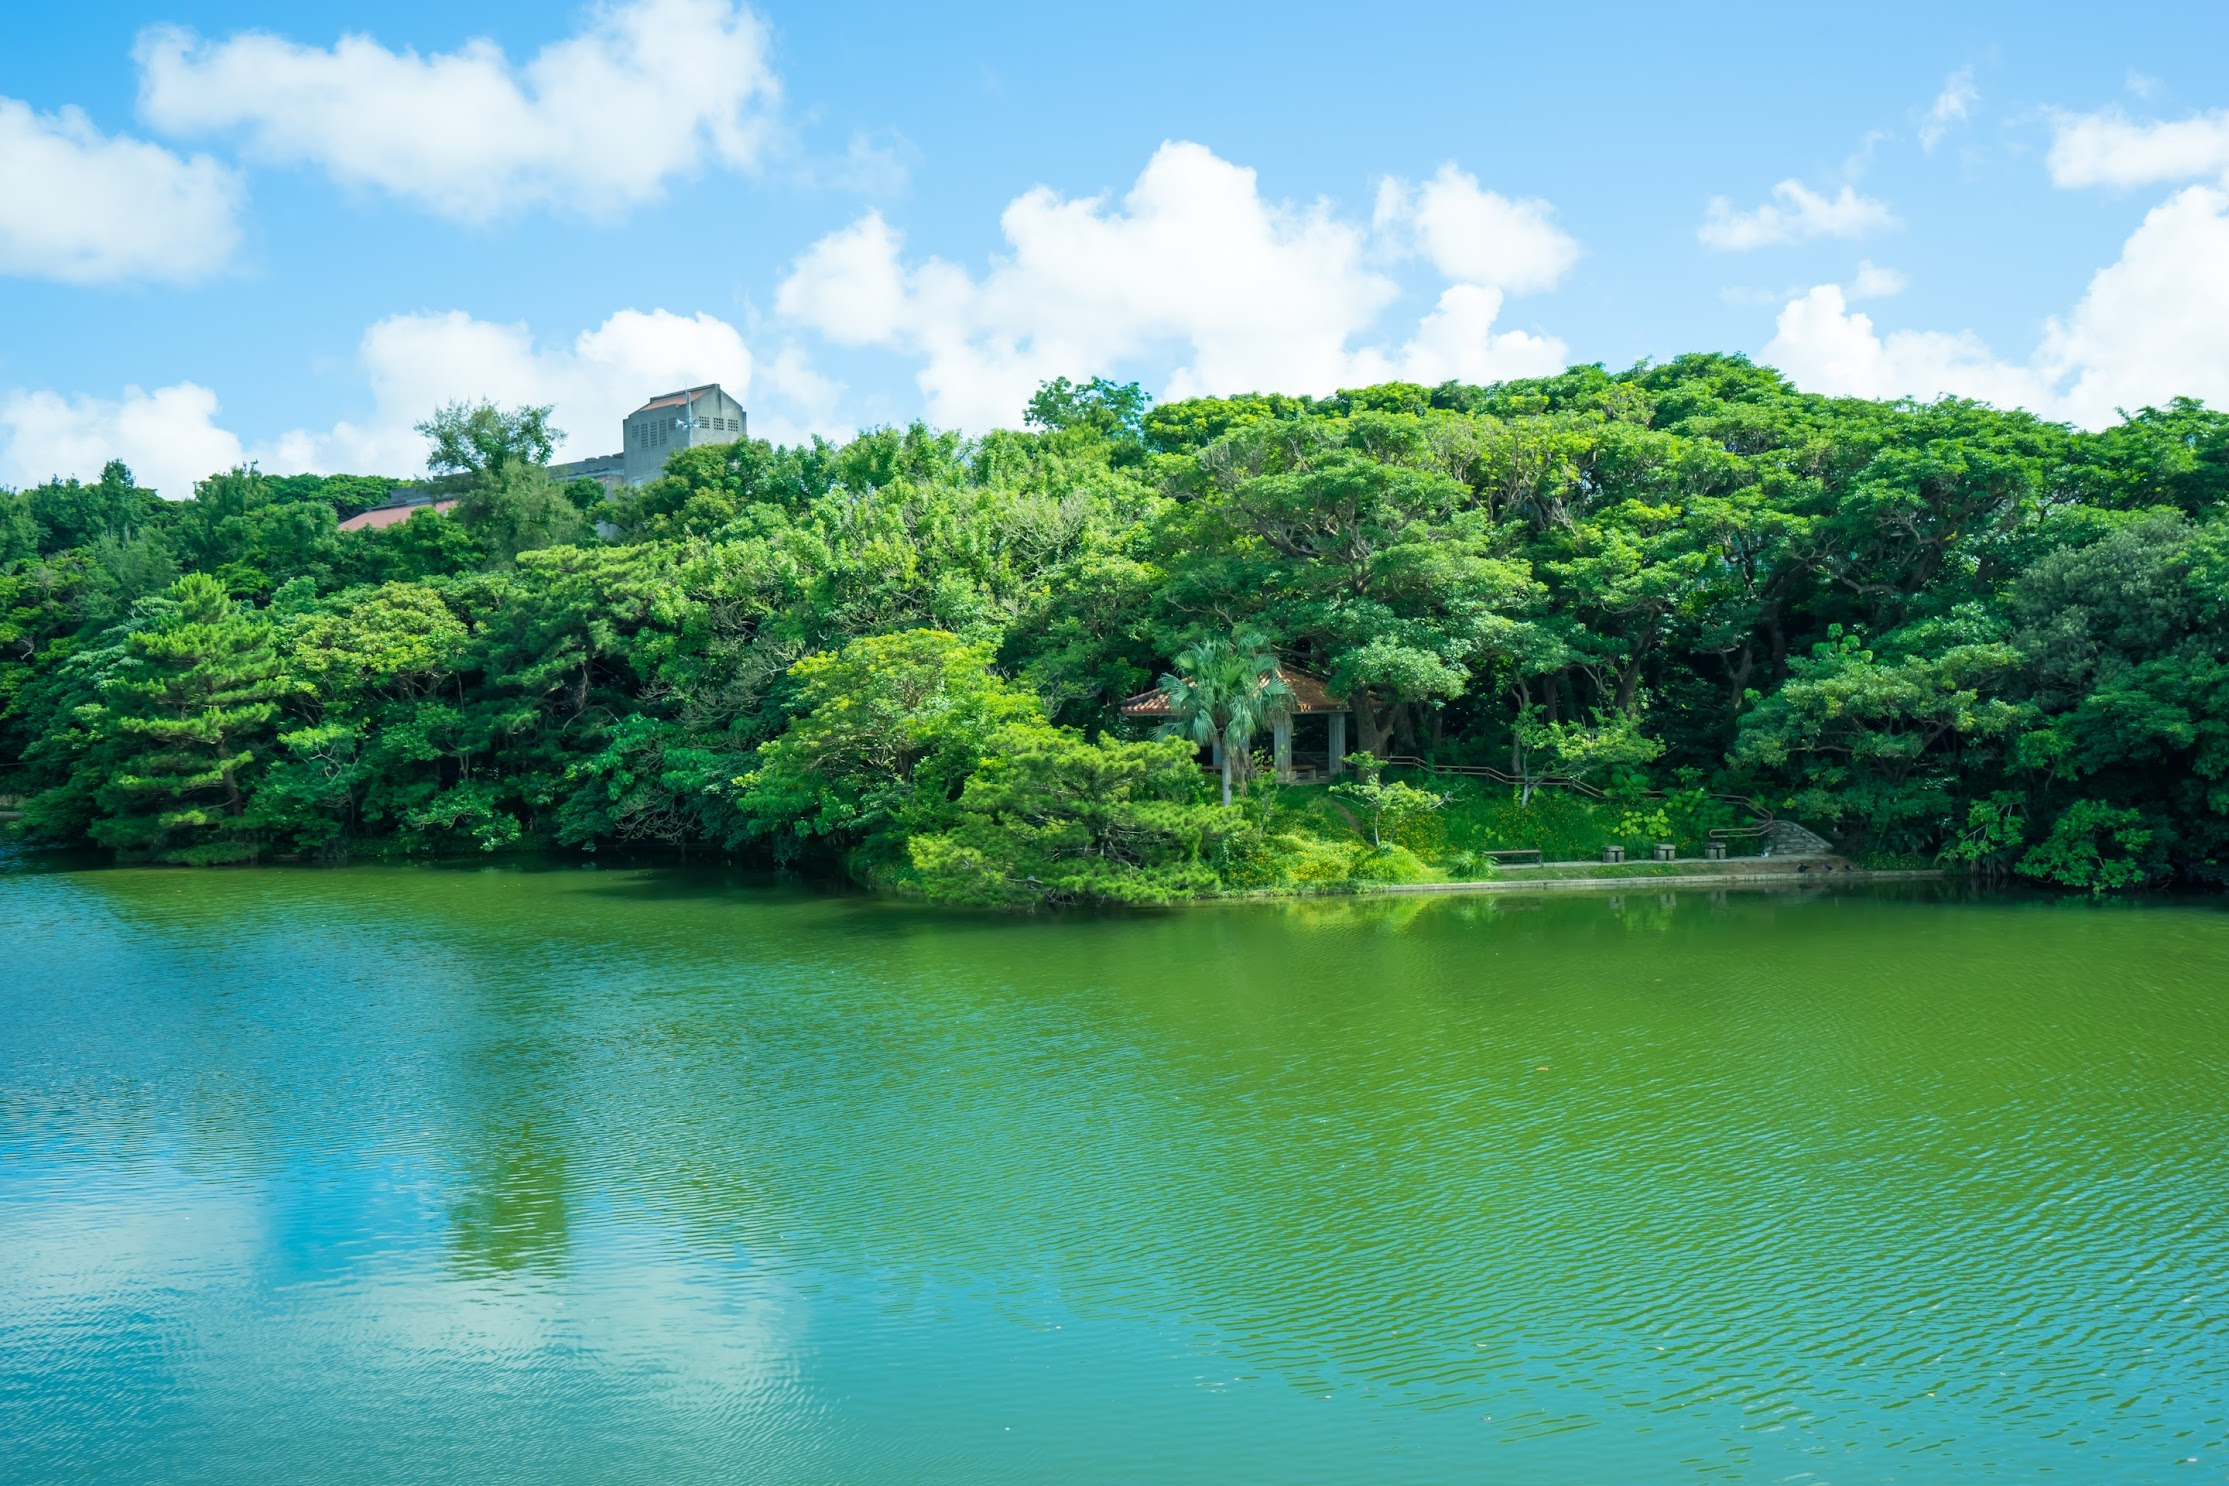 Ryutan Pond